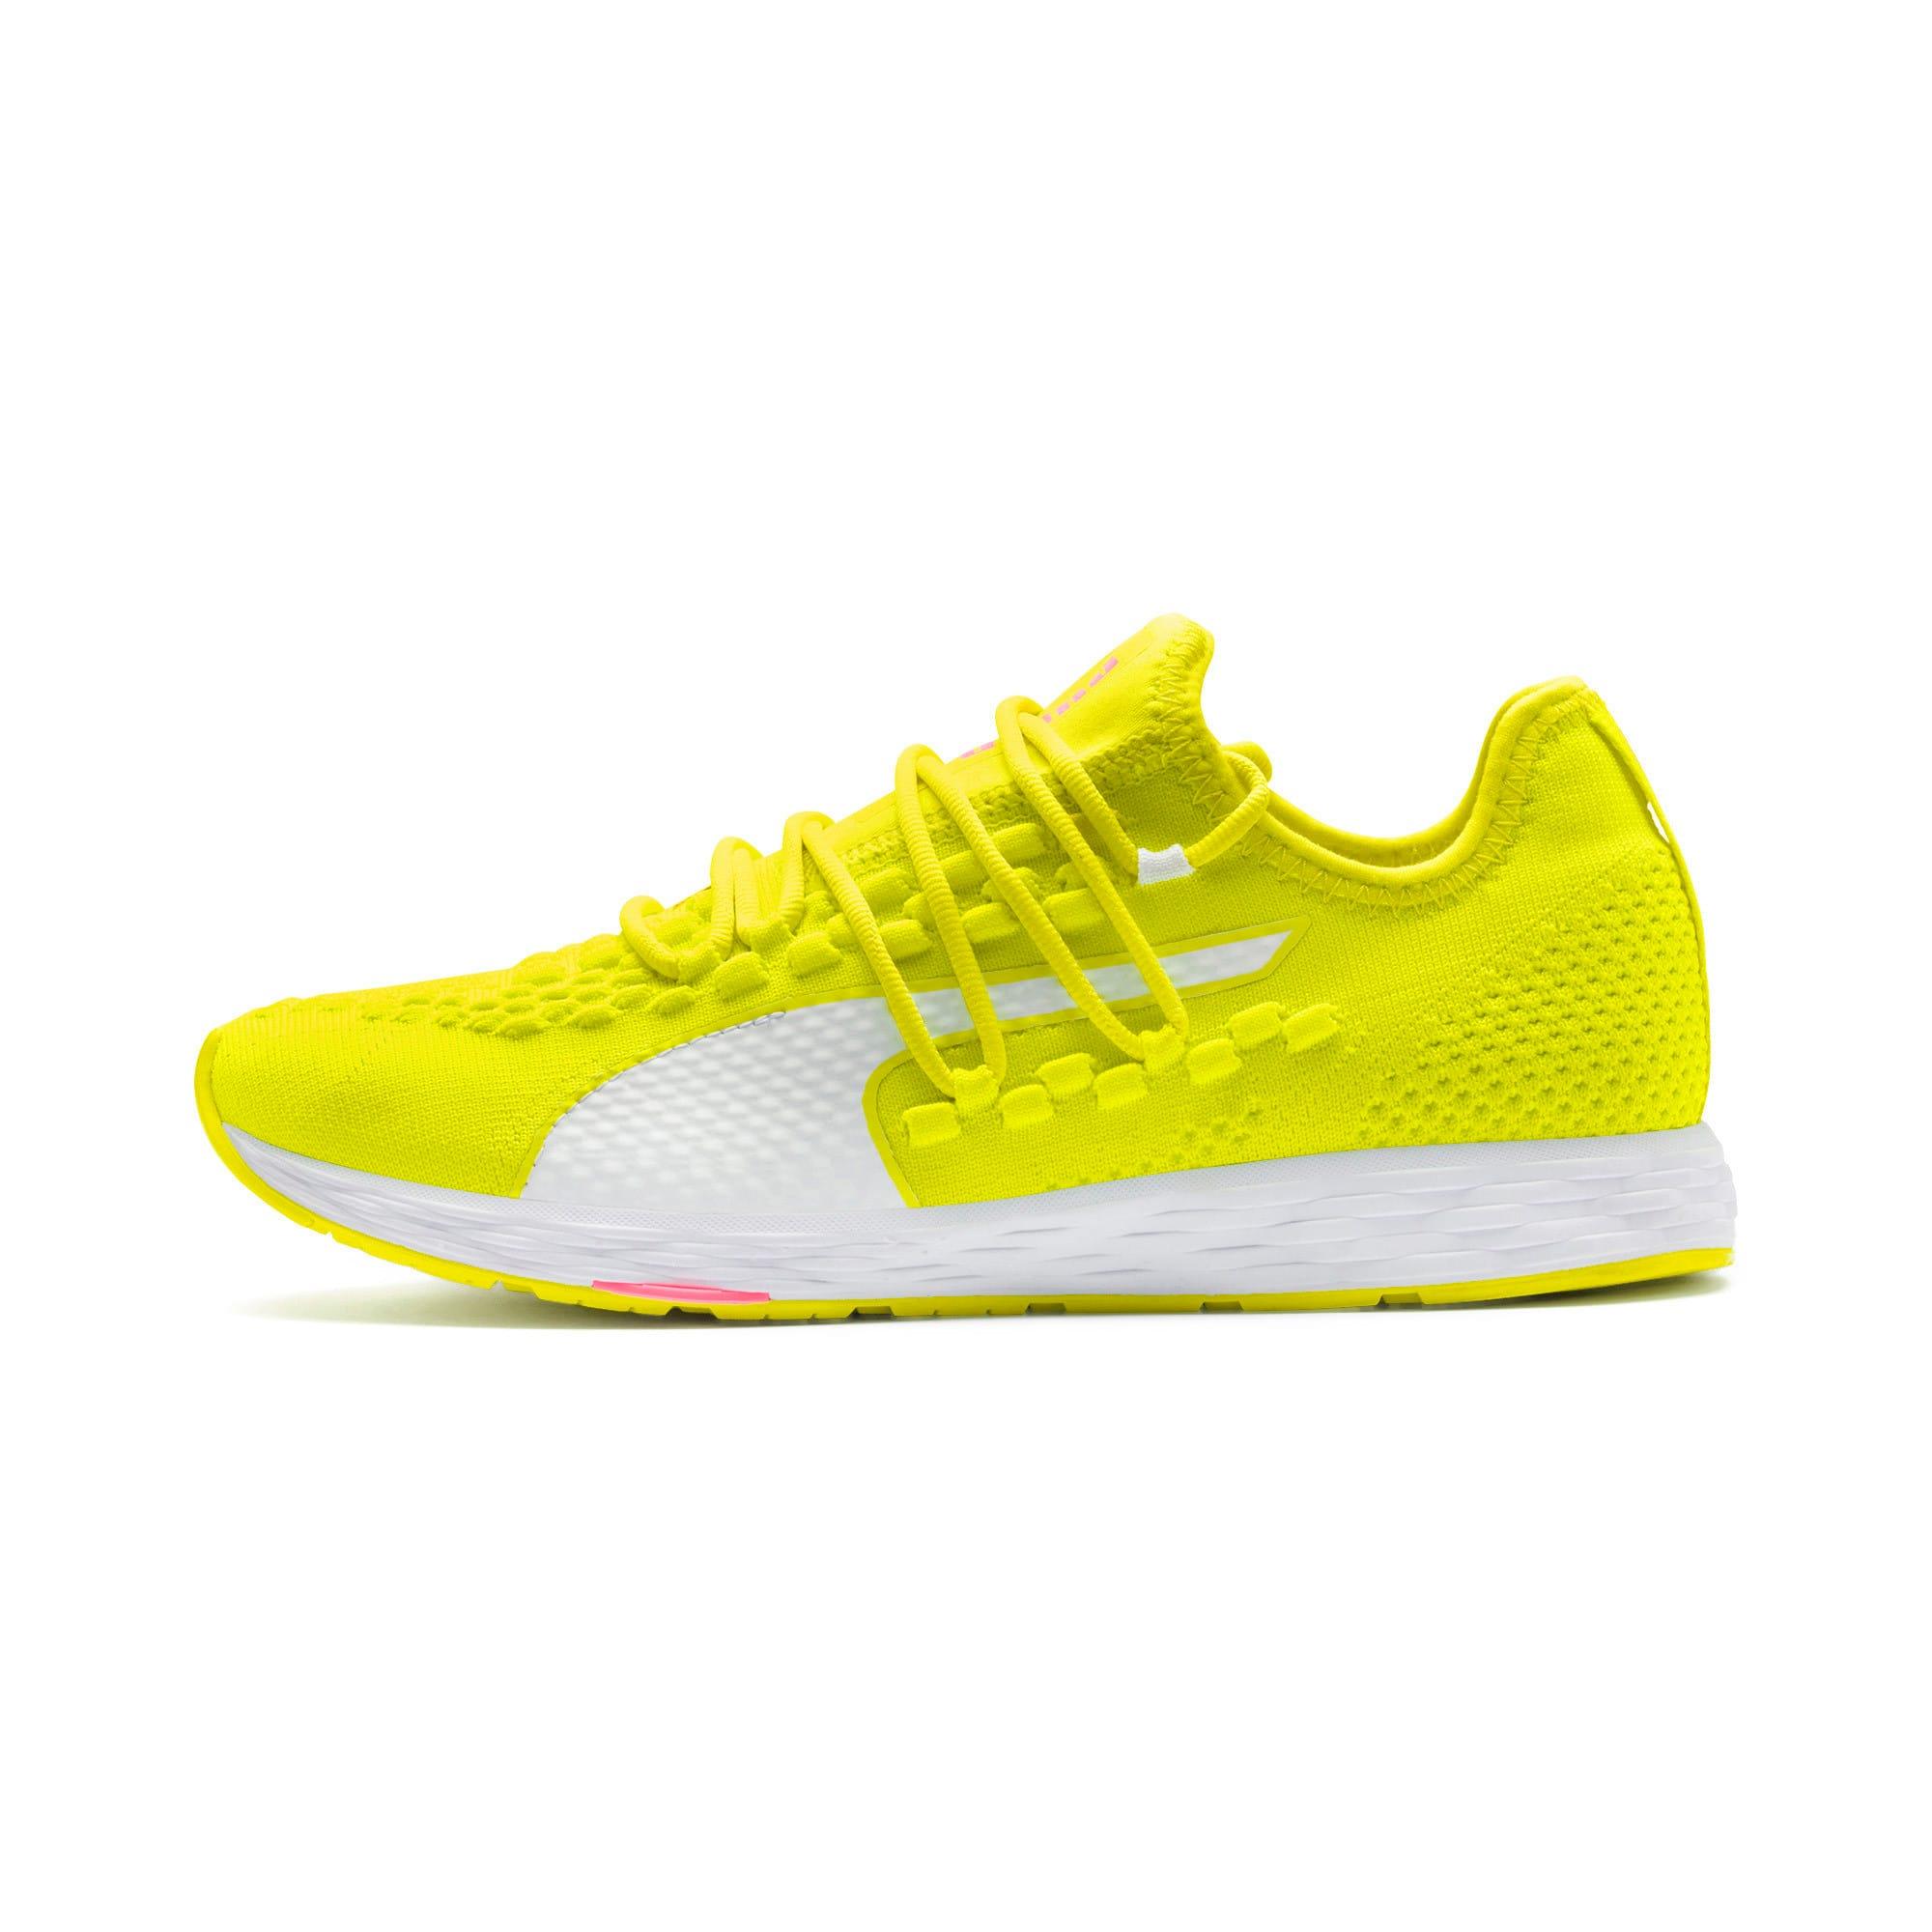 Thumbnail 1 of SPEED RACER Women's Running Shoes, Yellow-White-Pink Alert, medium-IND